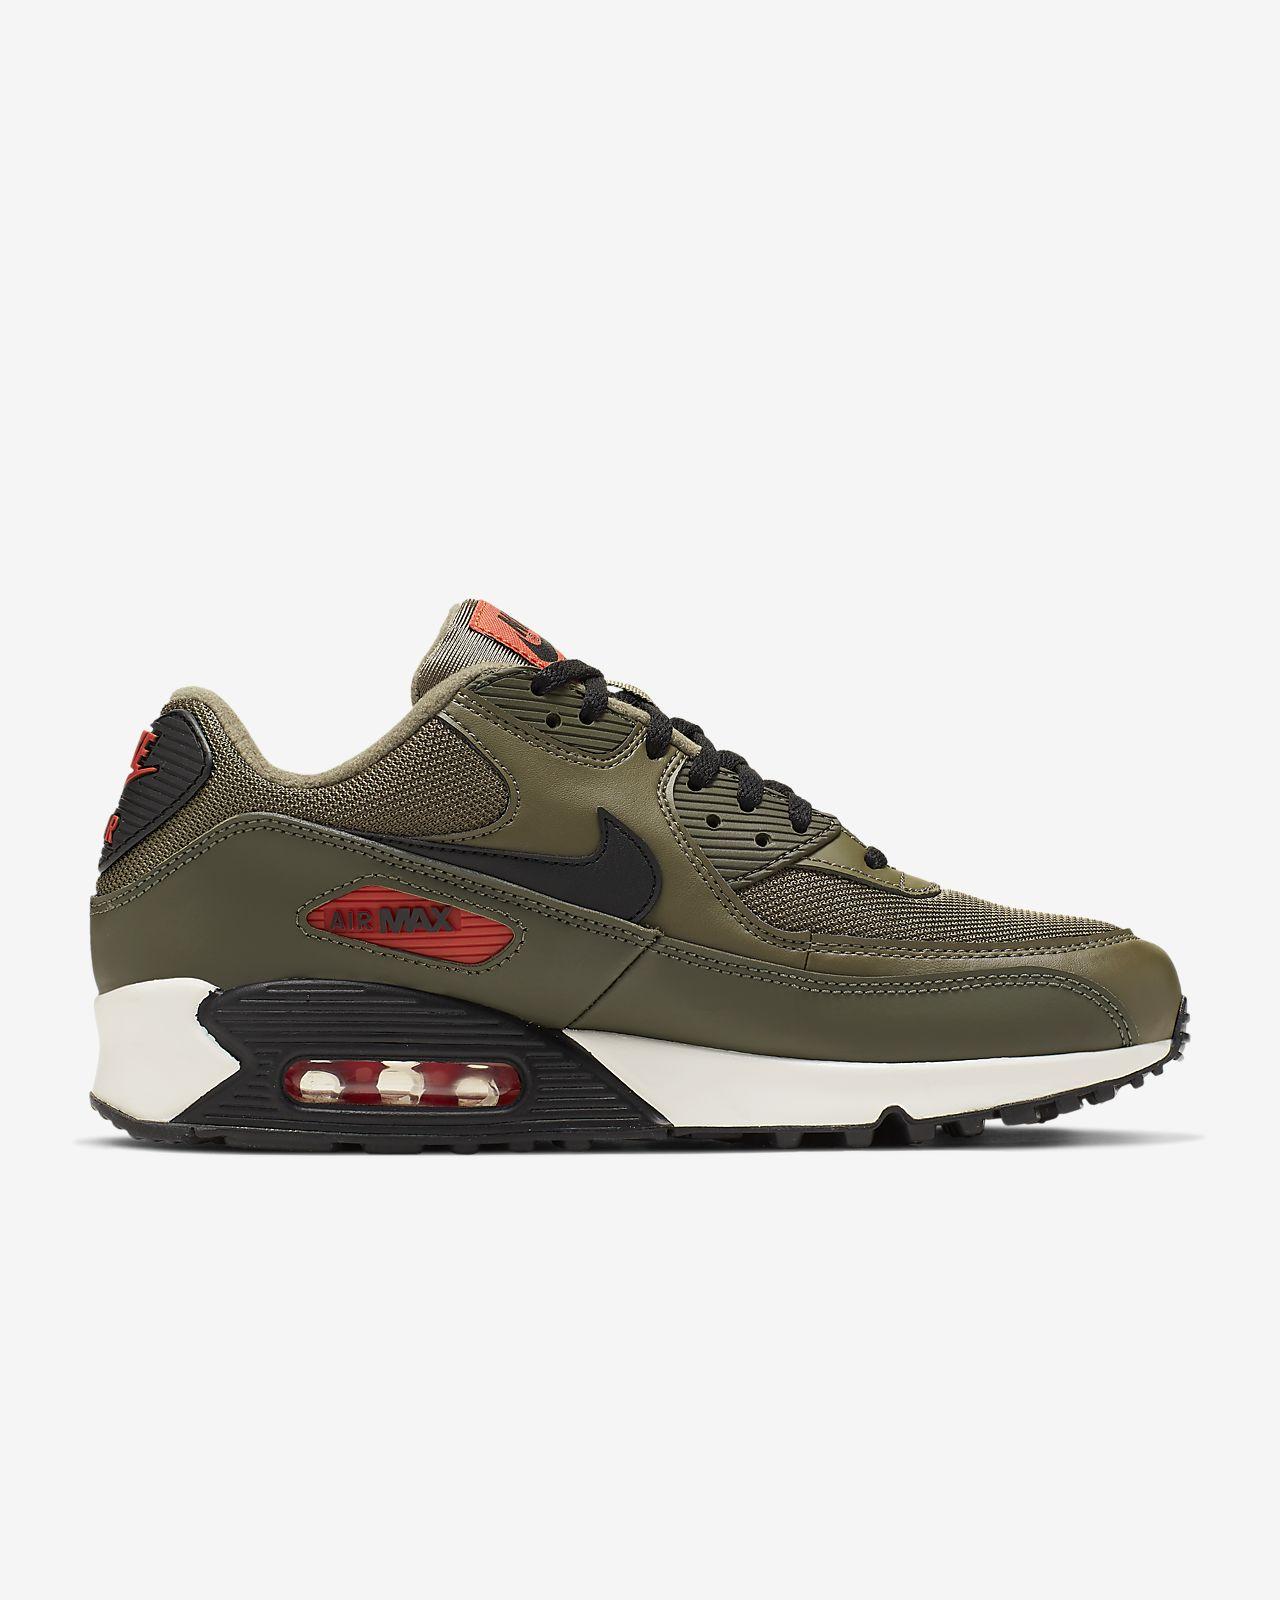 Nike Air max 90 ess homme kaki noir orange